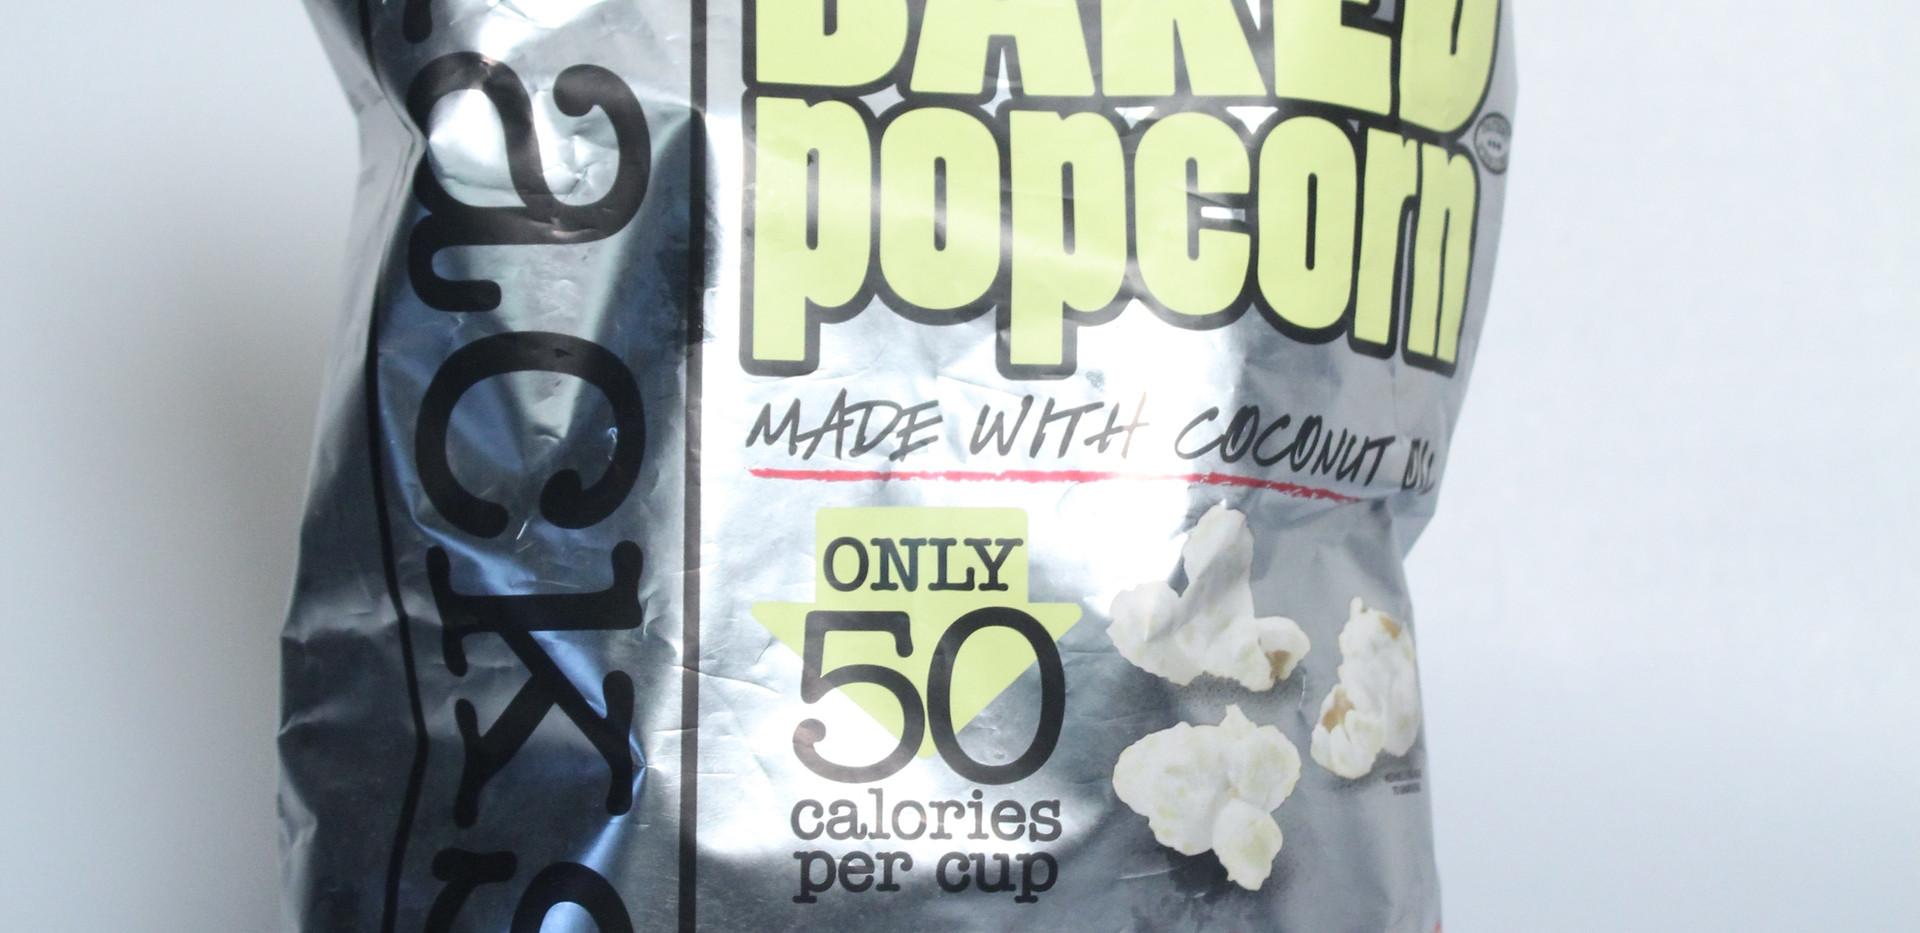 baked popcorn.jpg